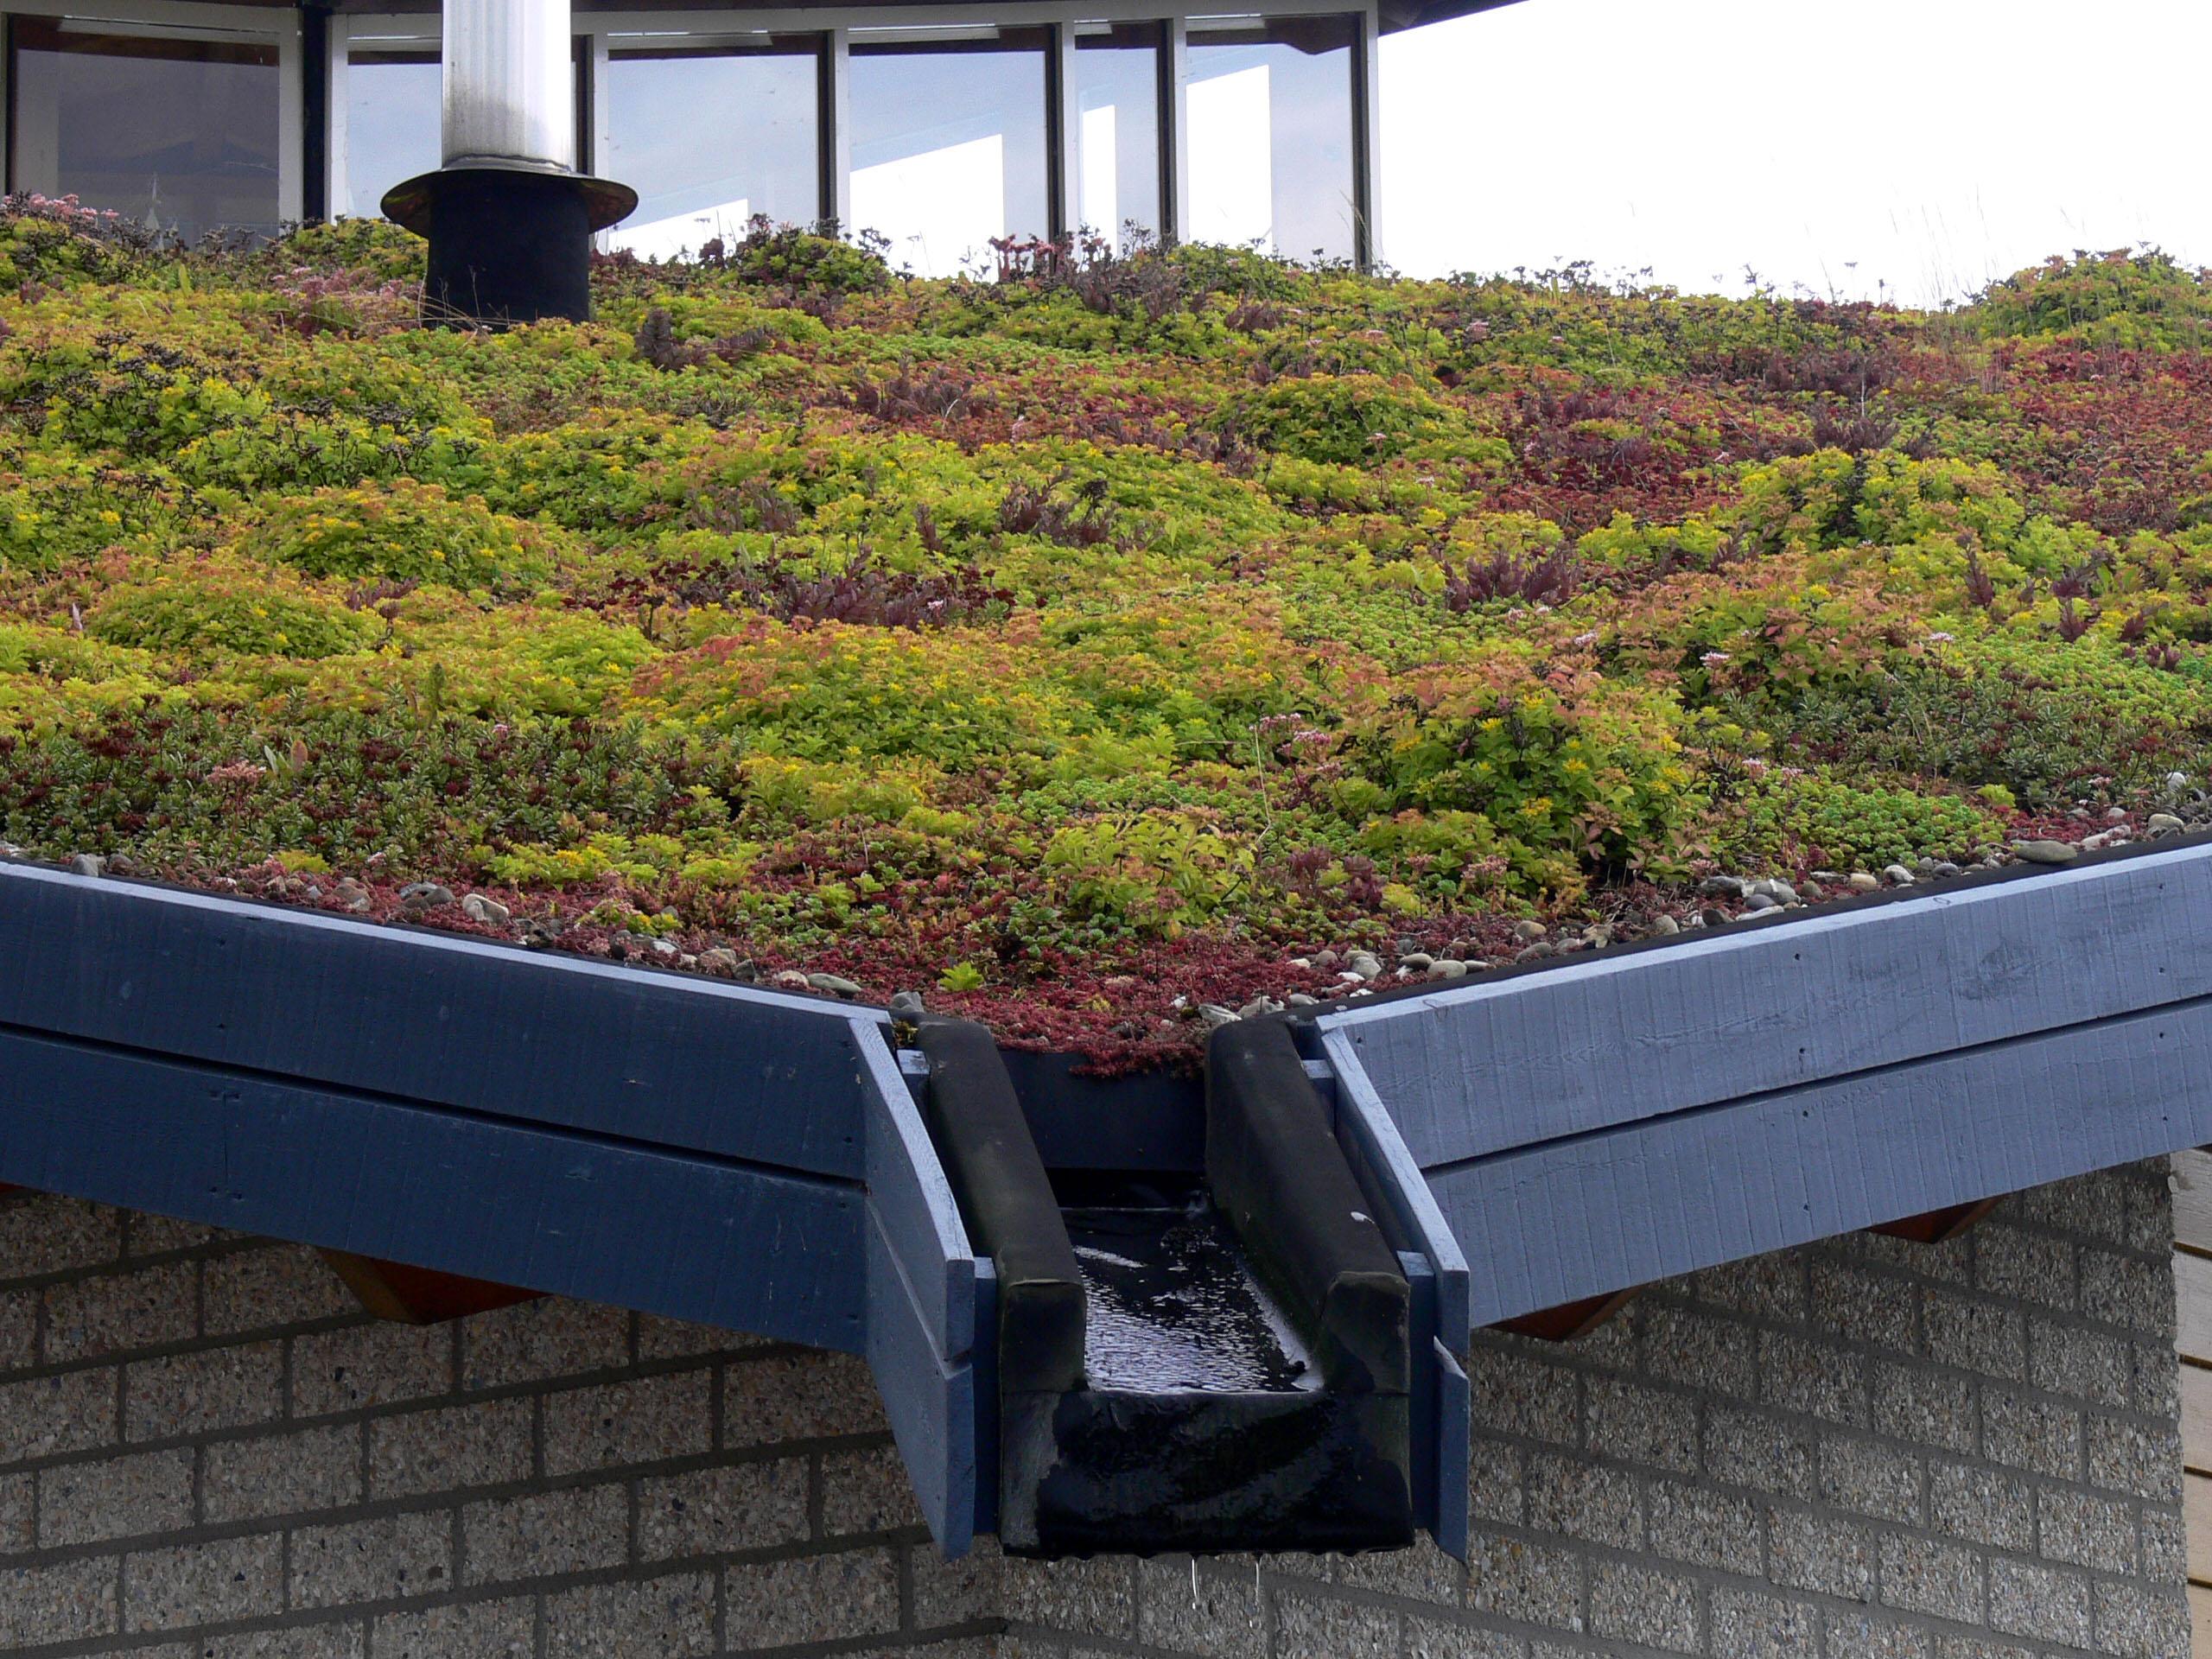 file eva lanxmeer green roof2 wikimedia commons. Black Bedroom Furniture Sets. Home Design Ideas